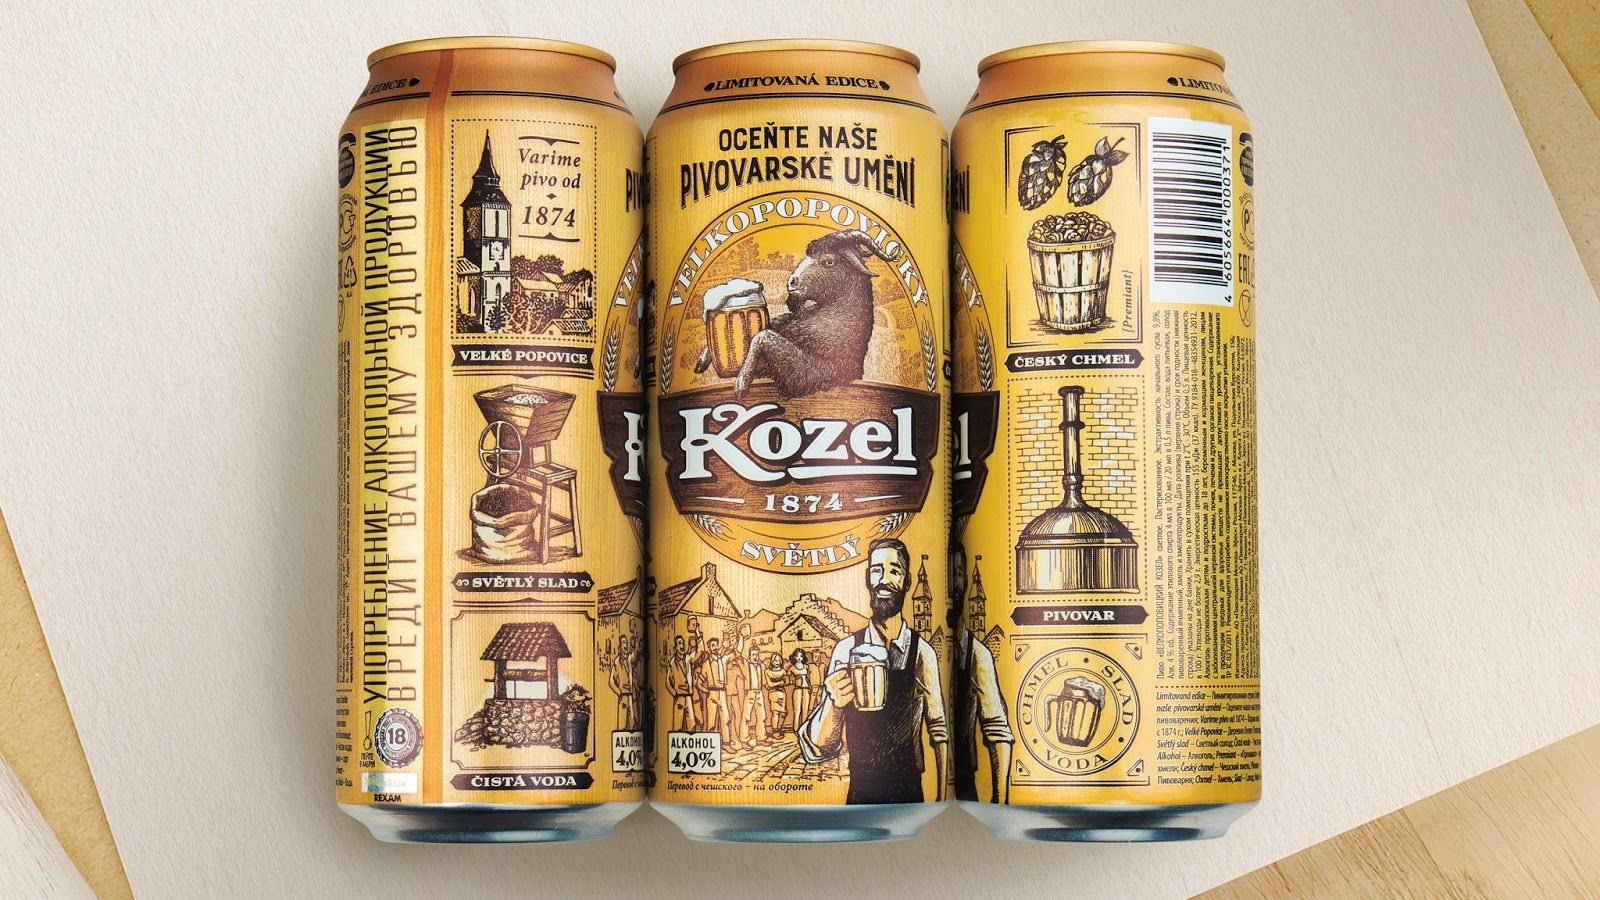 Velkopopovicky Kozel Limited Edition Ocente Nase Pivovarske